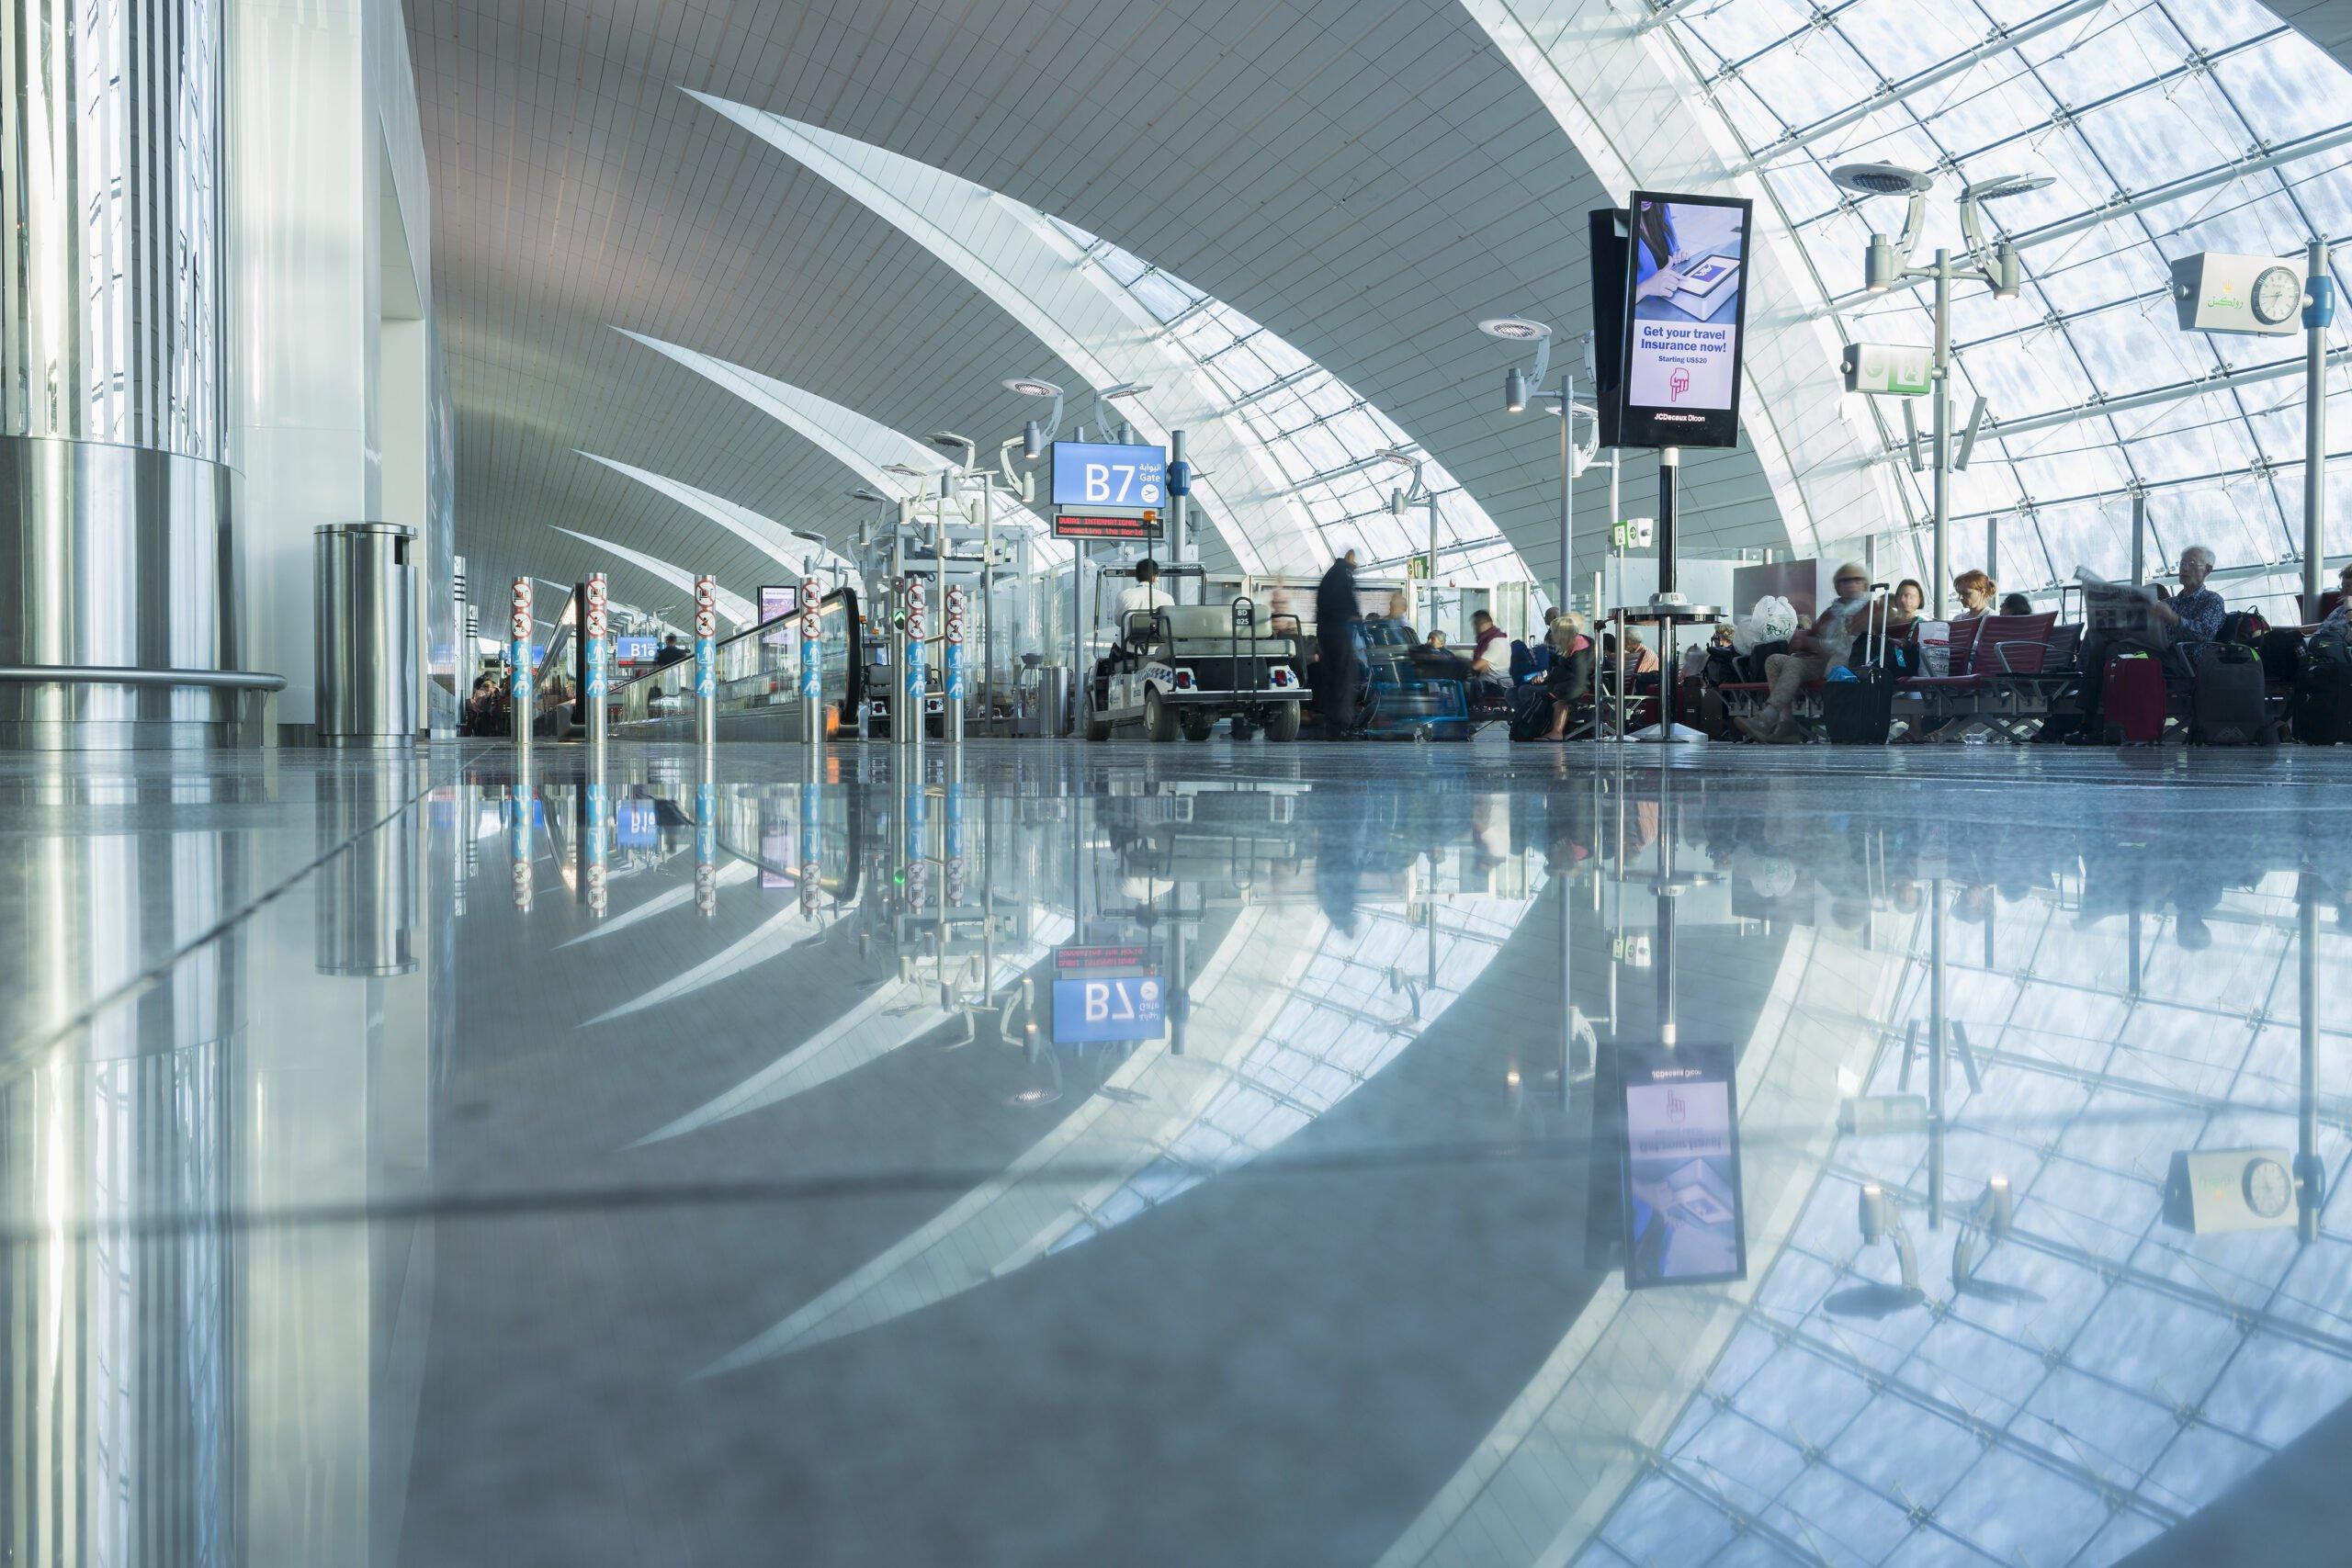 Traveling between terminals at Dubai International Airport